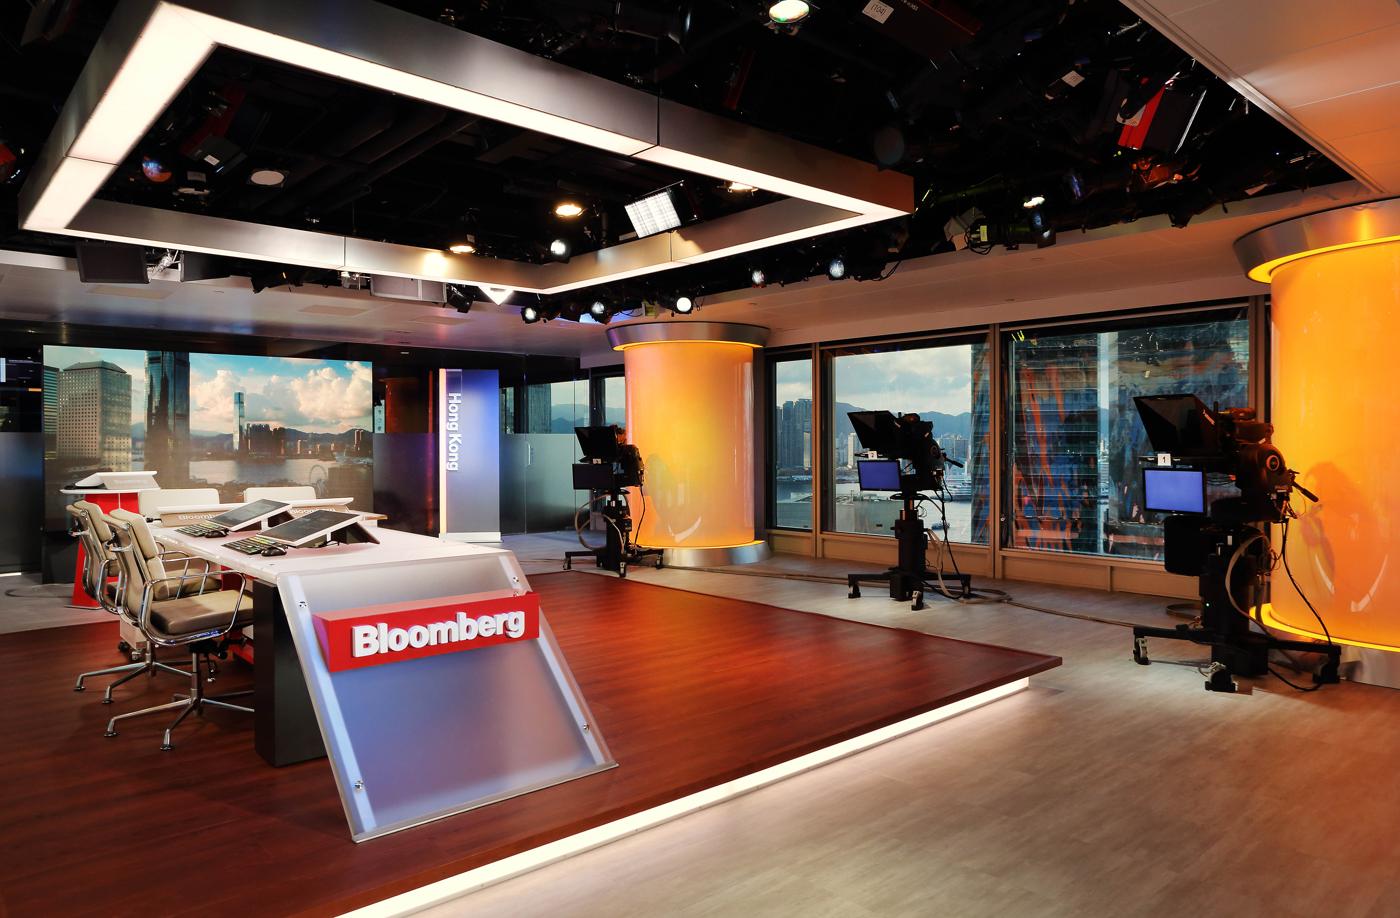 ncs_bloomberg-hong-kong-tv-studio_0002